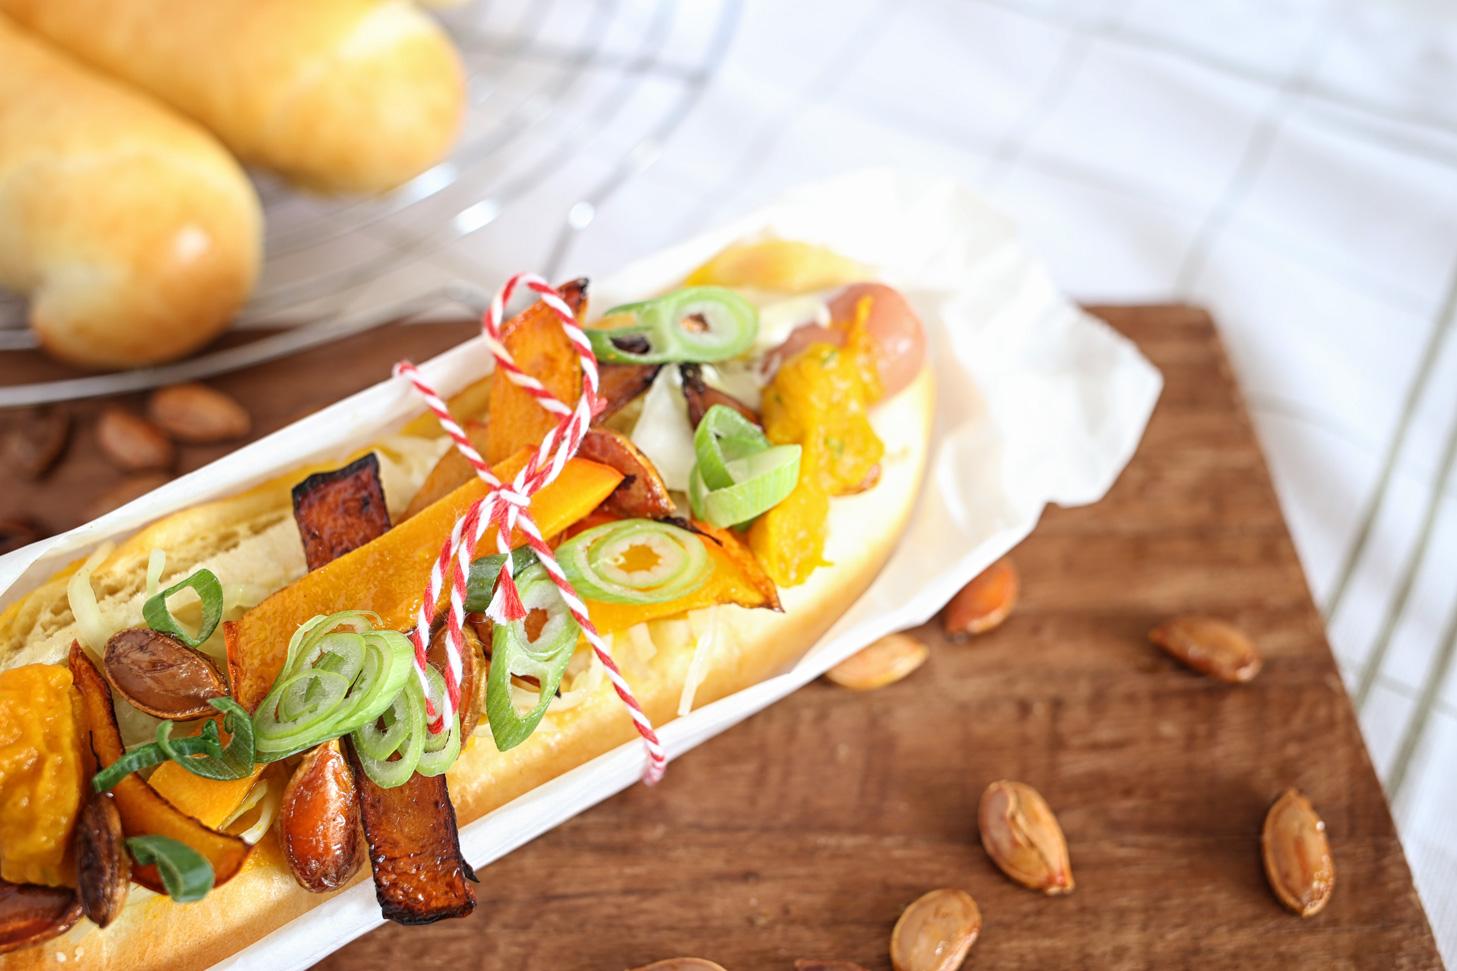 heisser hund verliebt im k rbis der hot dog adventskalender pottgew chs. Black Bedroom Furniture Sets. Home Design Ideas